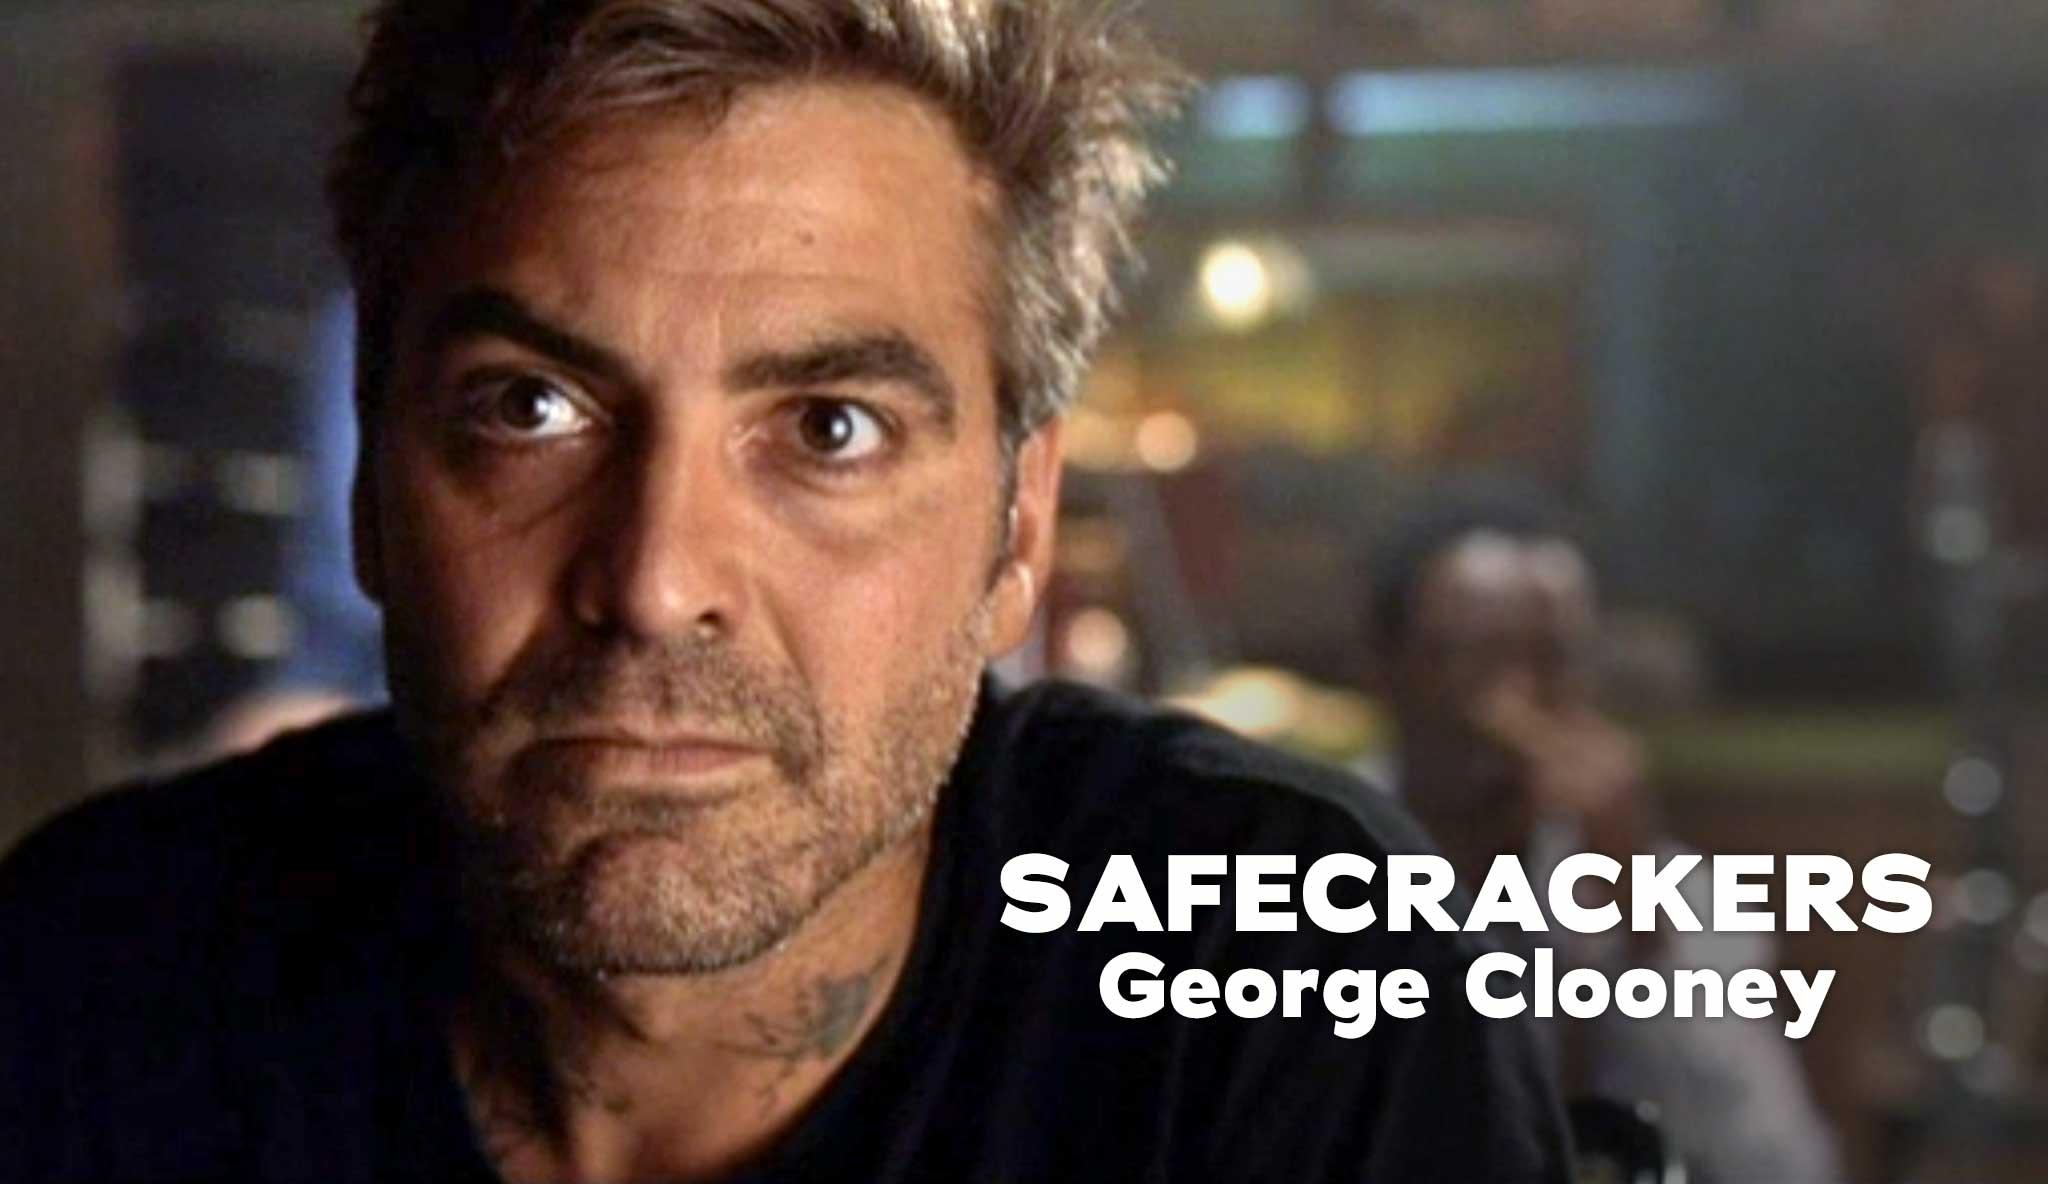 safecrackers\header.jpg